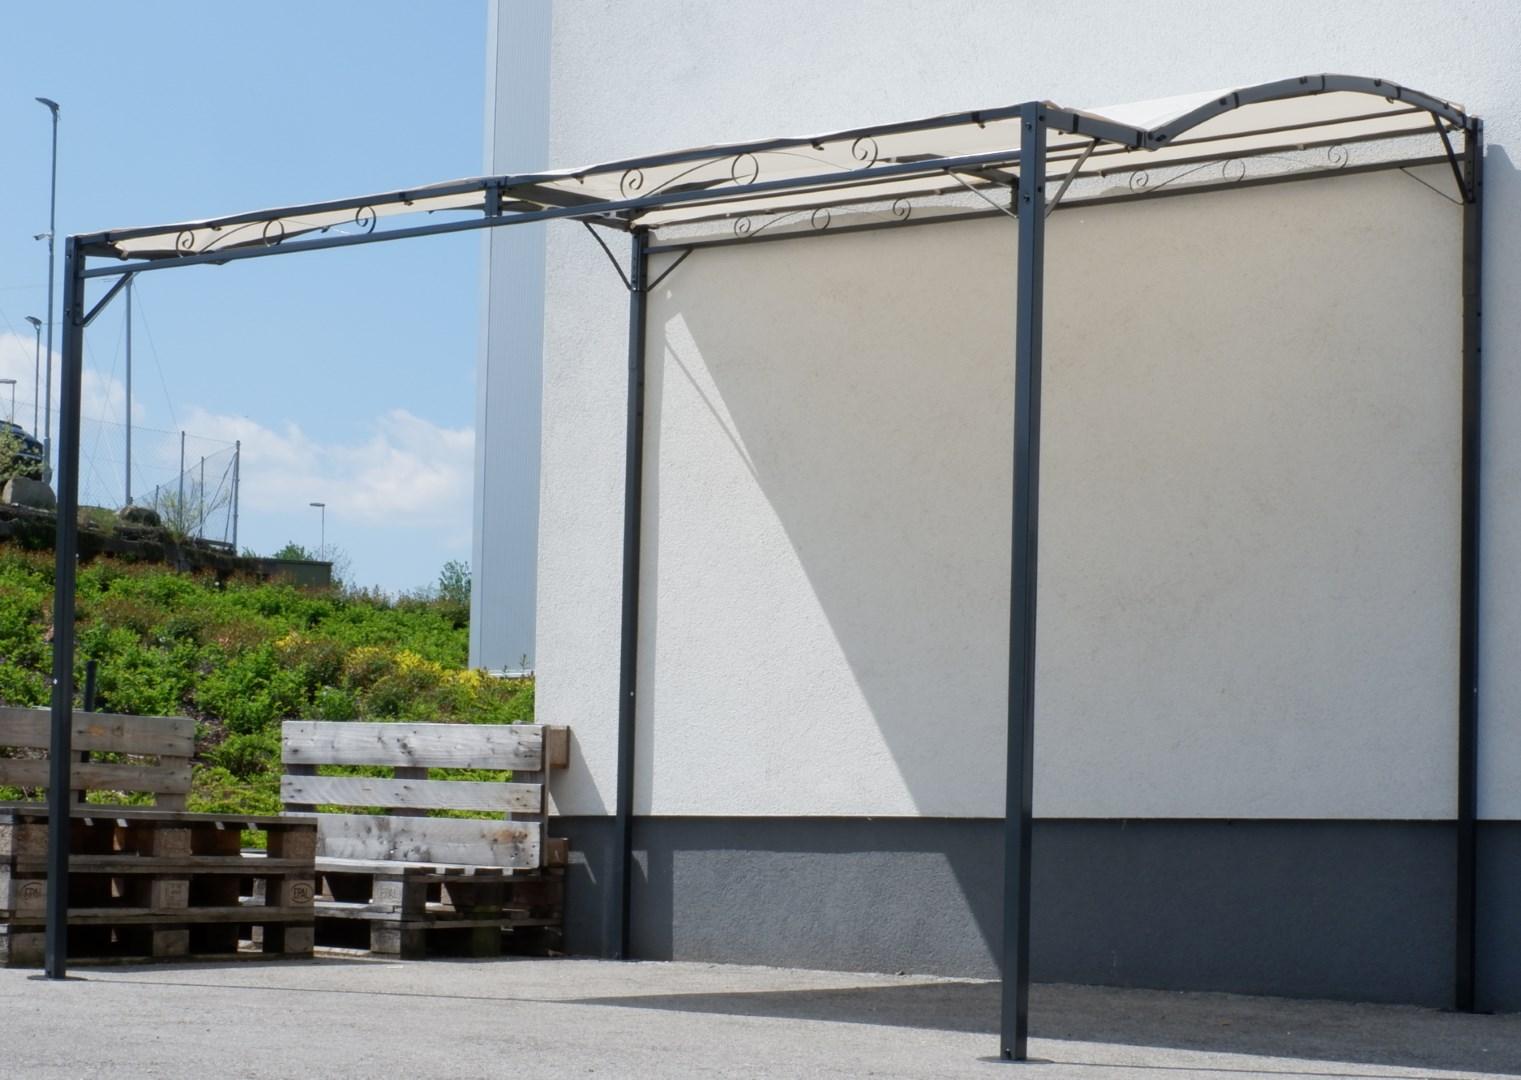 wand anbau pavillon 3 x 2 5 meter mit dach 100 wasserdicht uv30 model topea alles f r garten